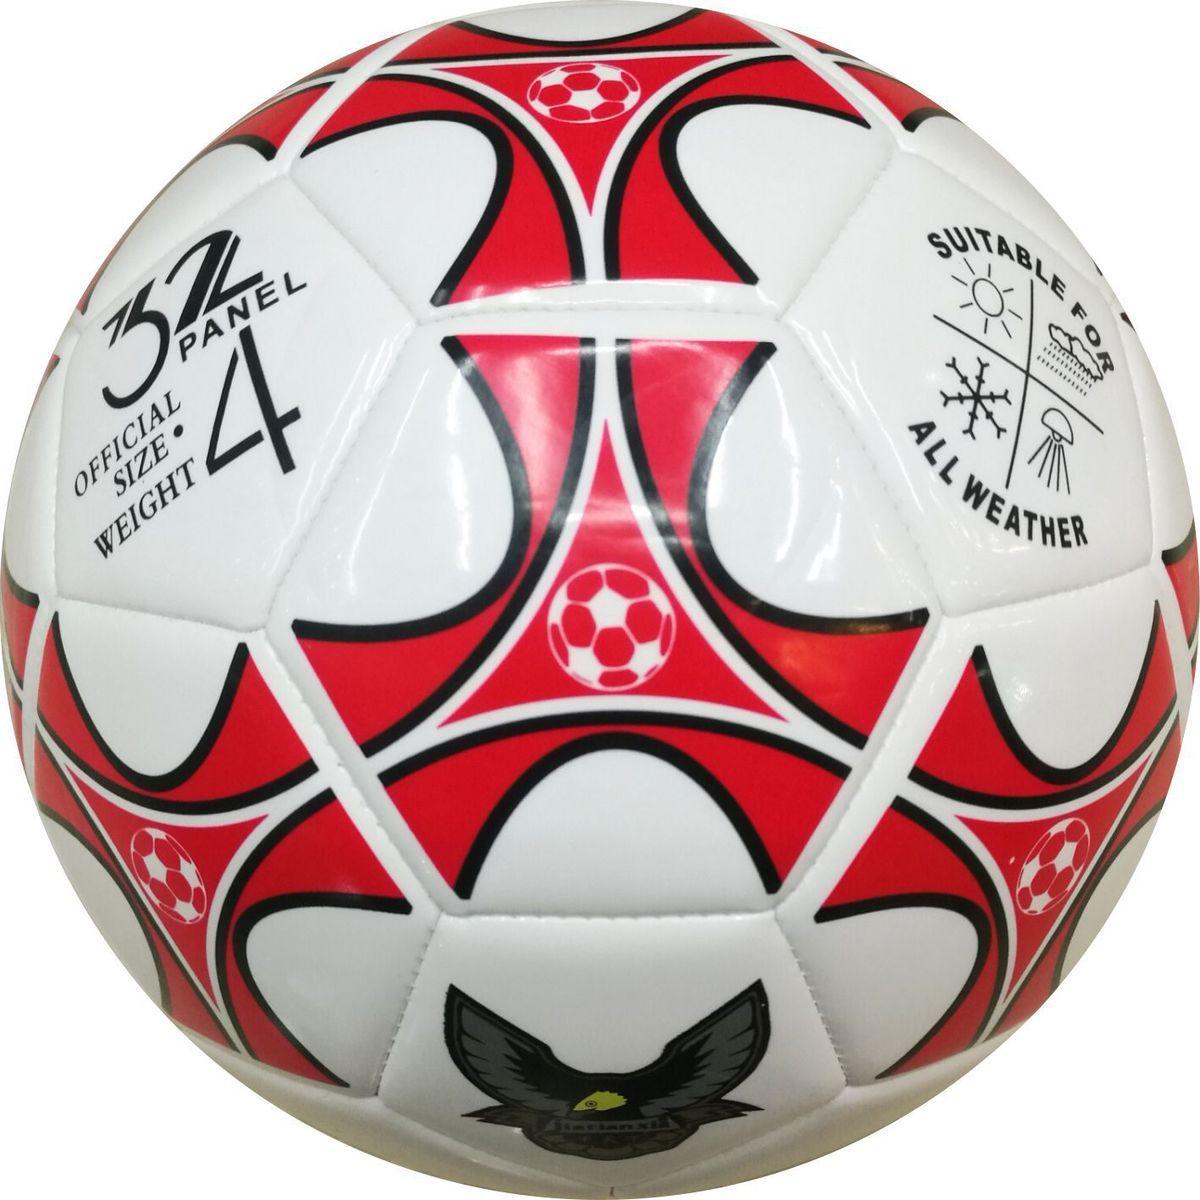 2019 Size 4 Balls For Futsal Pu Training Football For Men And Women Soccer  Balls High Quality Futbol Topu Boyutu 5 Z071OLF From Blacktiger 1f943d0e3